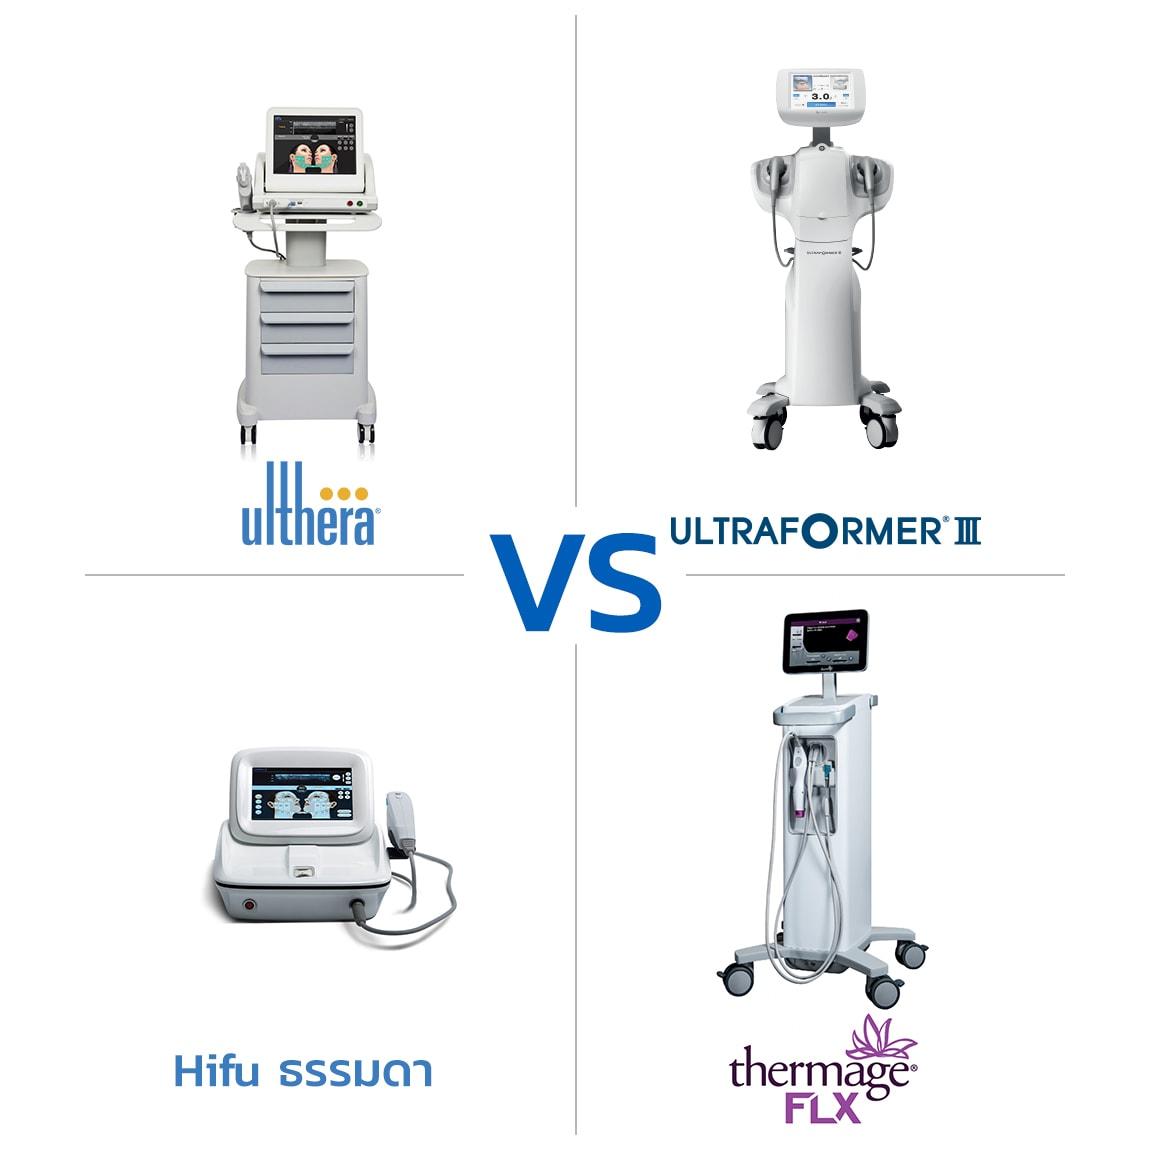 Ulthera vs Hifu macrofocus vs Hifu ธรรมดา vs Thermage flx